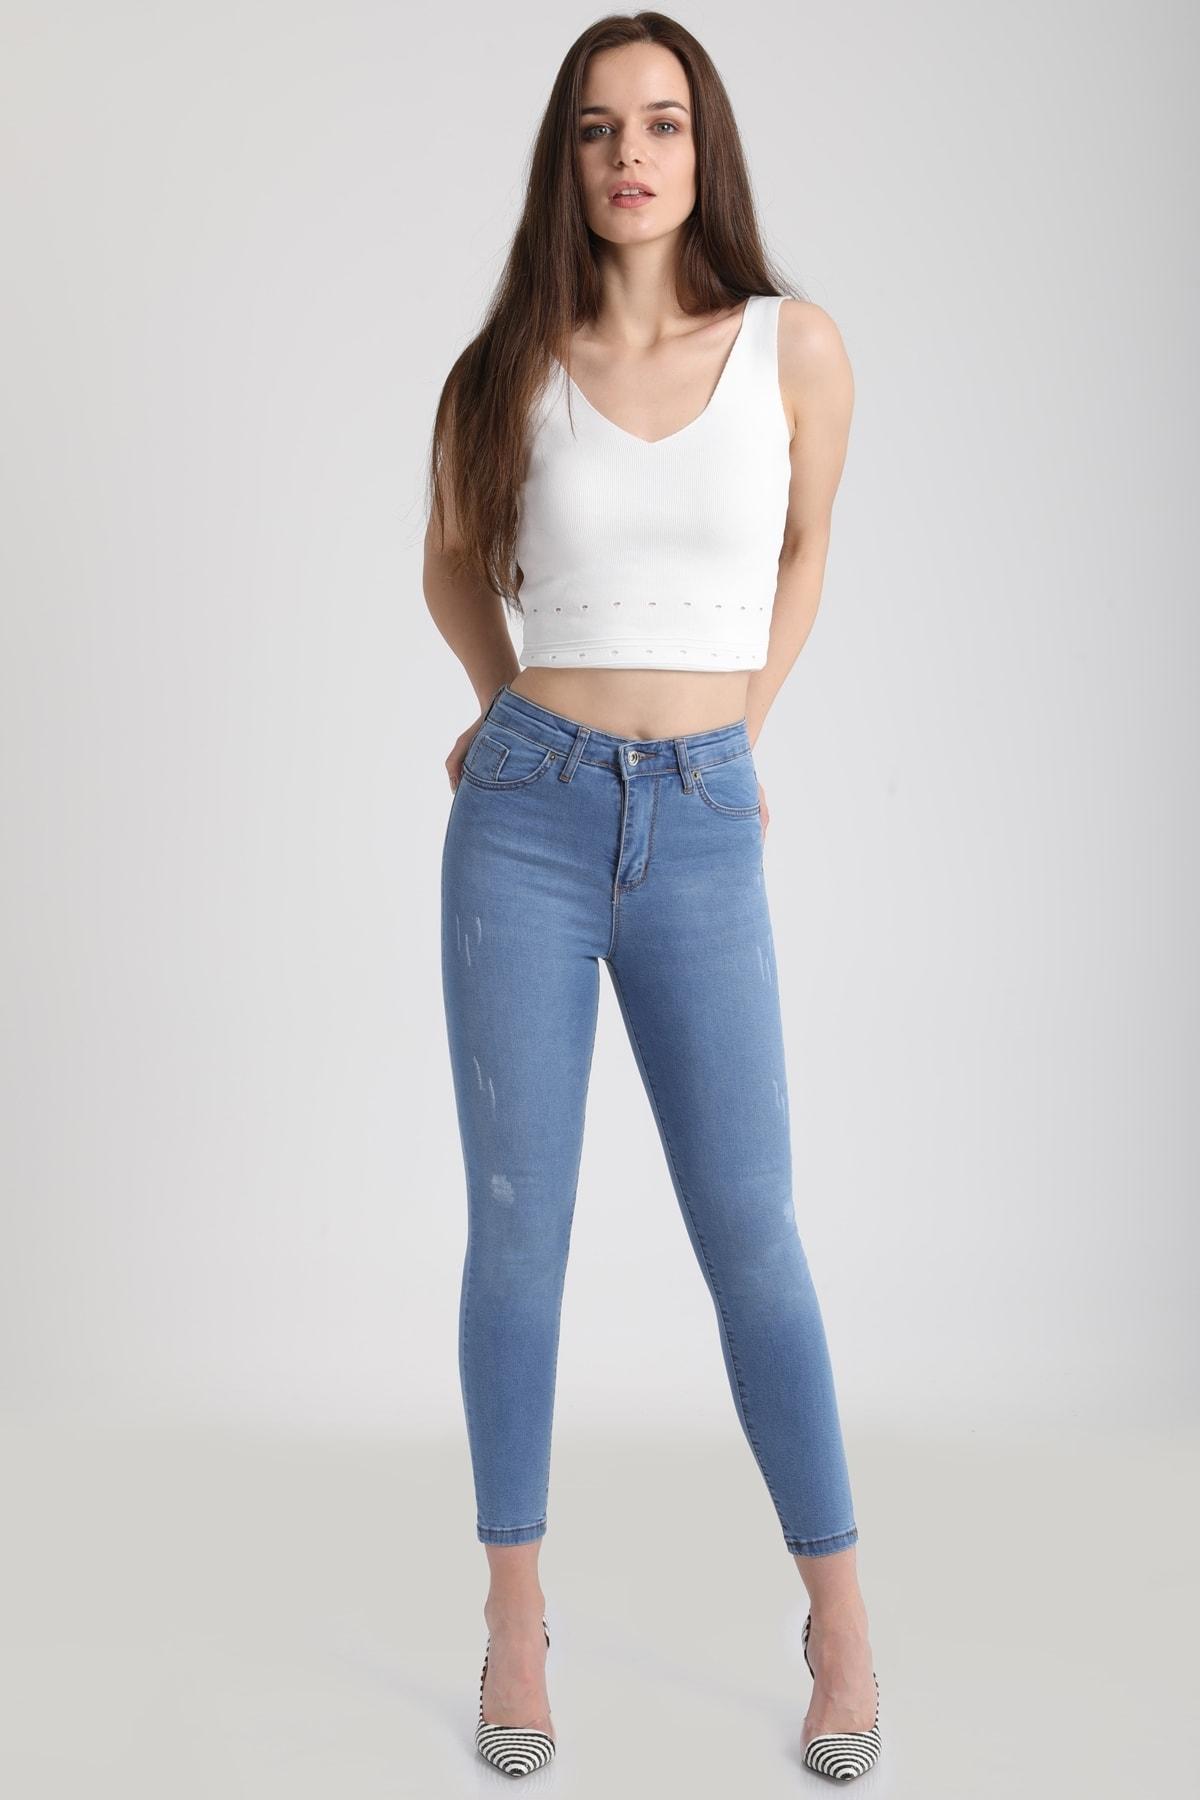 MD trend Kadın Buz Mavi Yüksek Bel Dar Paça Pantolon Jean Mdt3409 1